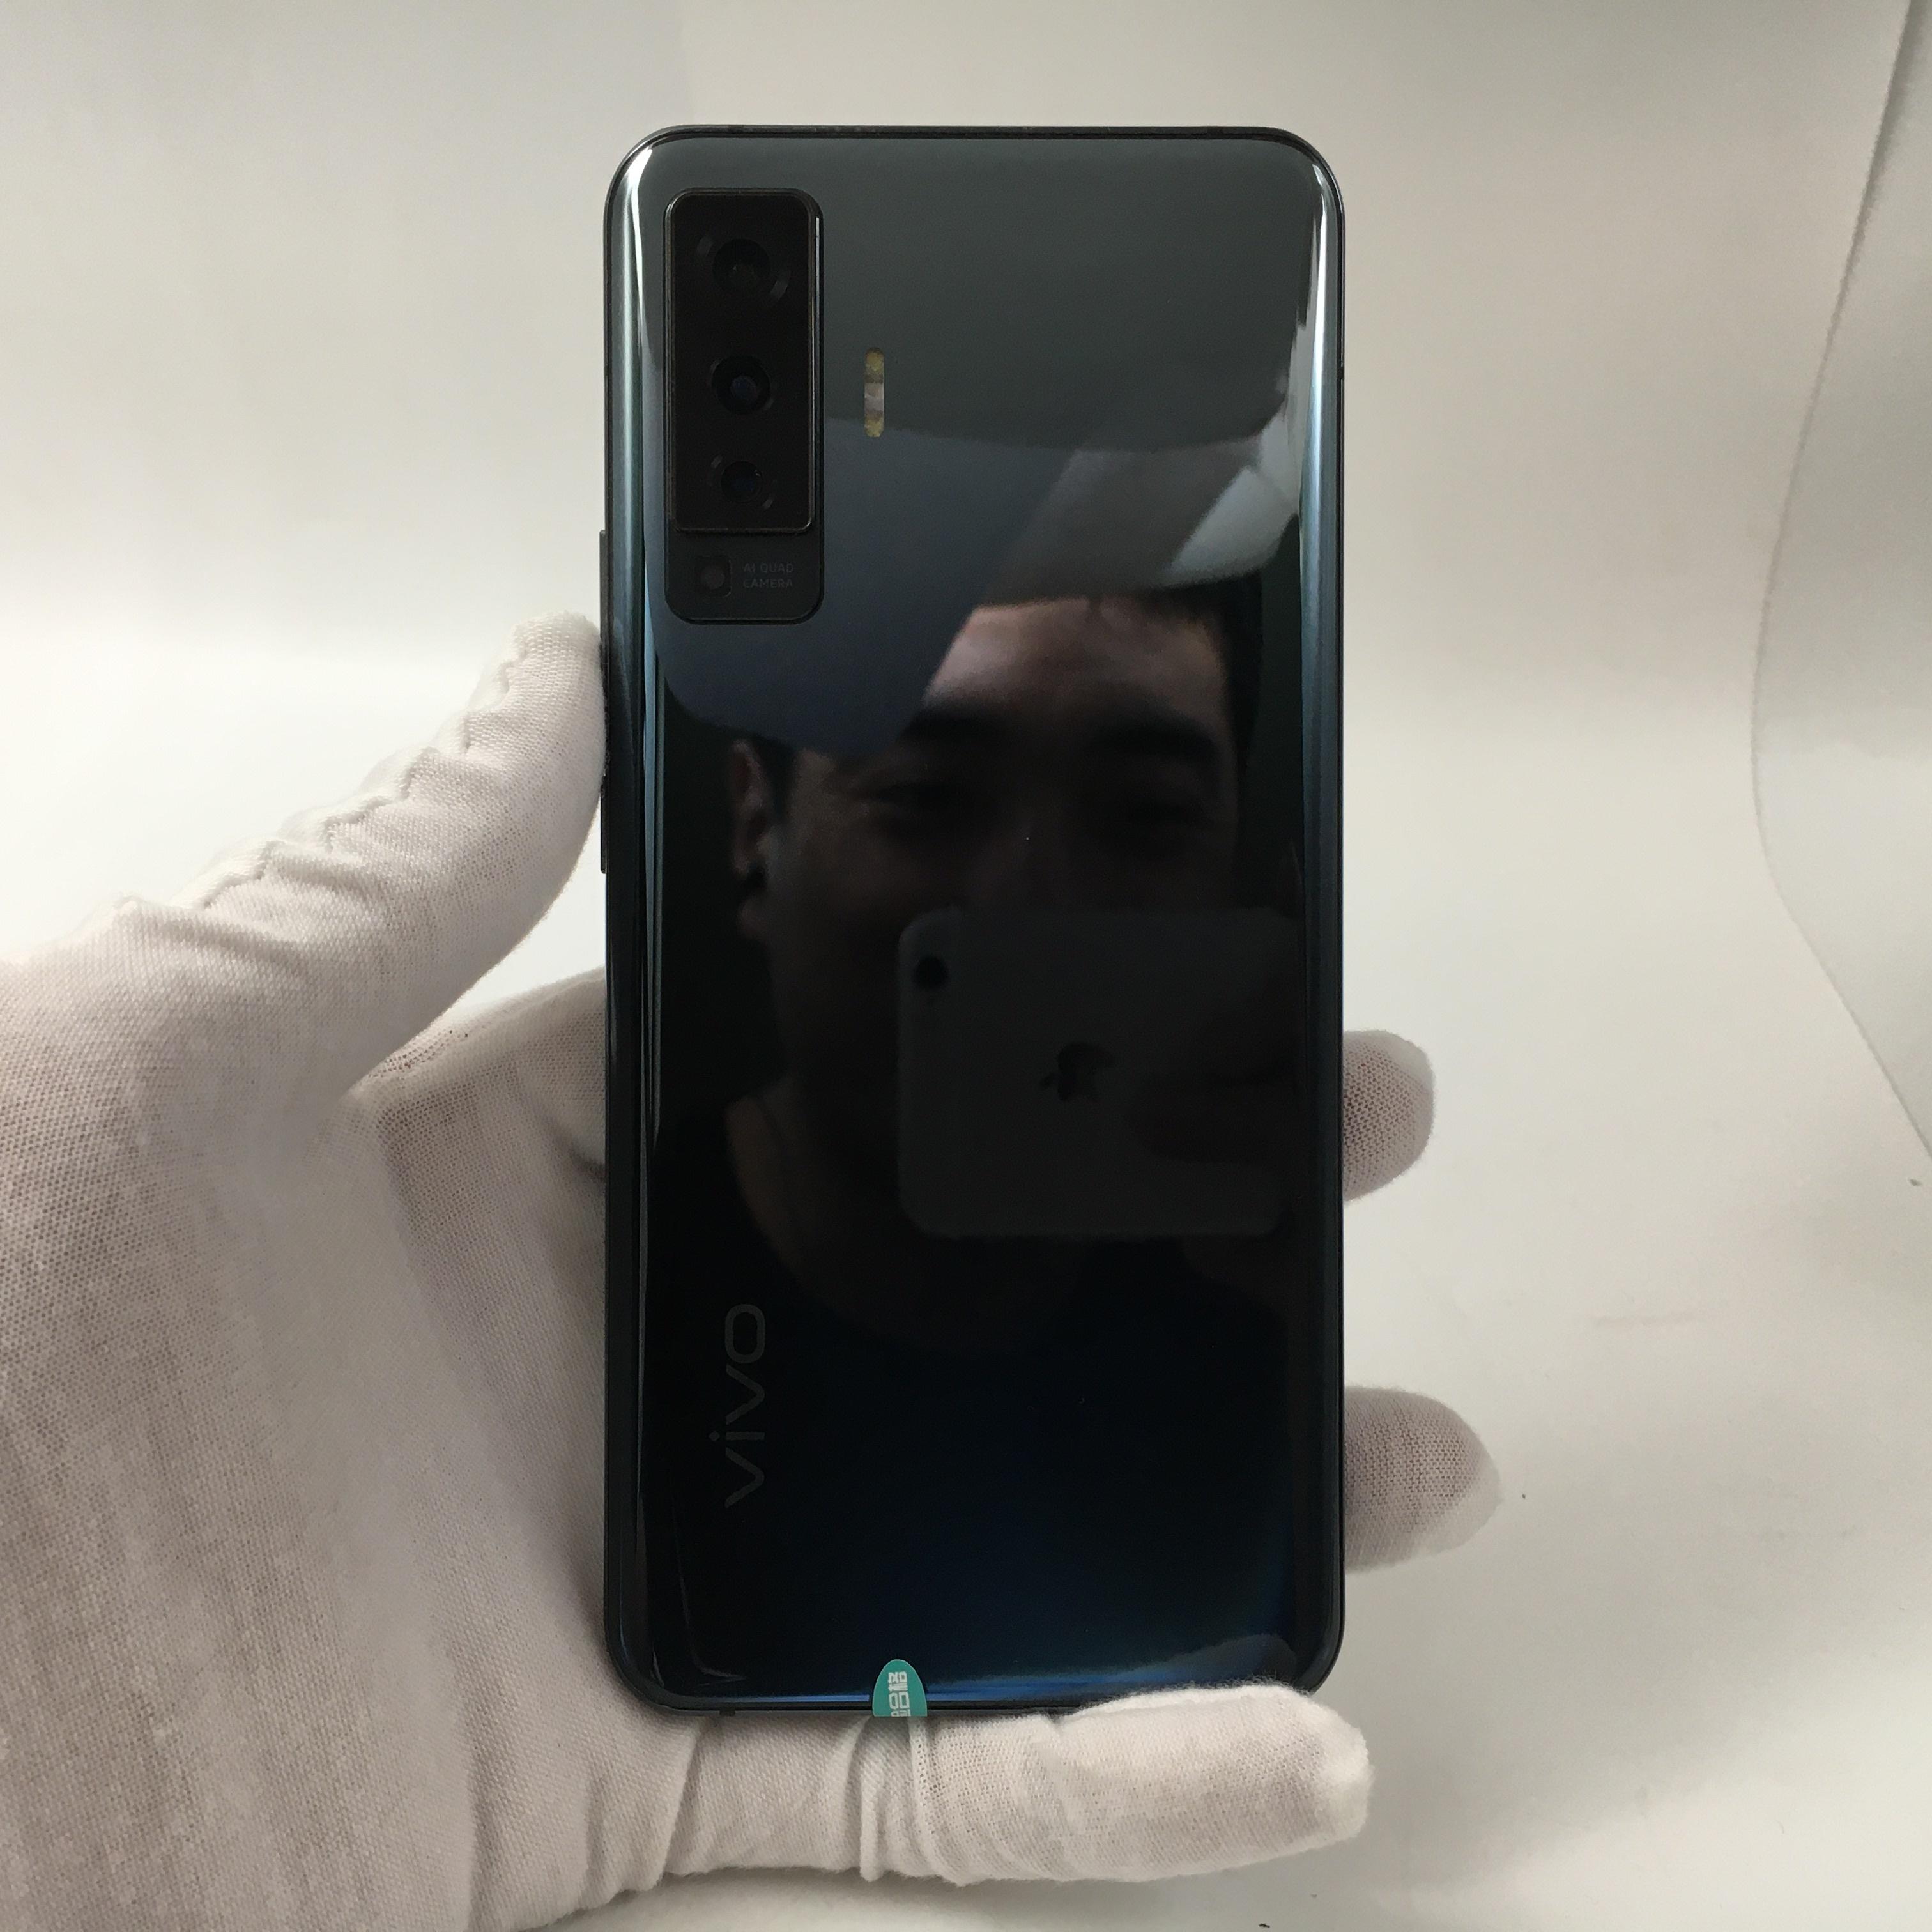 vivo【X50 5G】5G全网通 黑镜 8G/256G 国行 95新